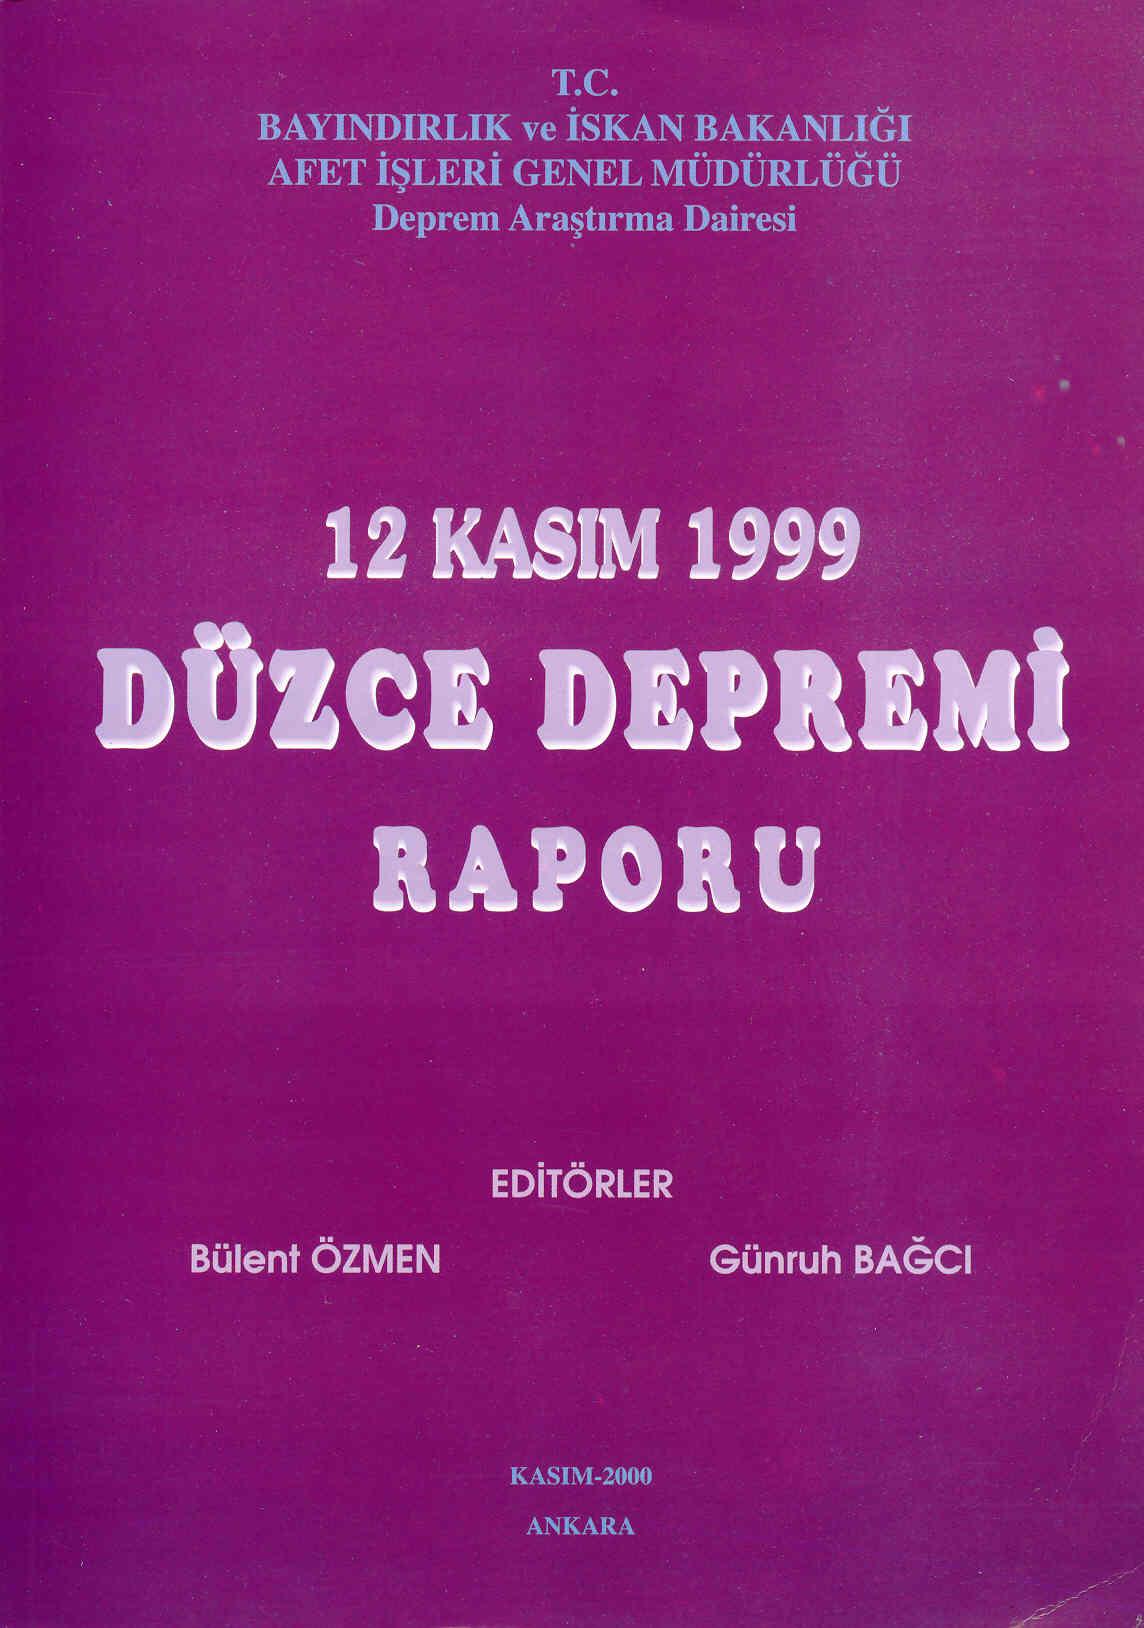 12 KASIM 1999 DÜZCE DEPREMİ RAPORU